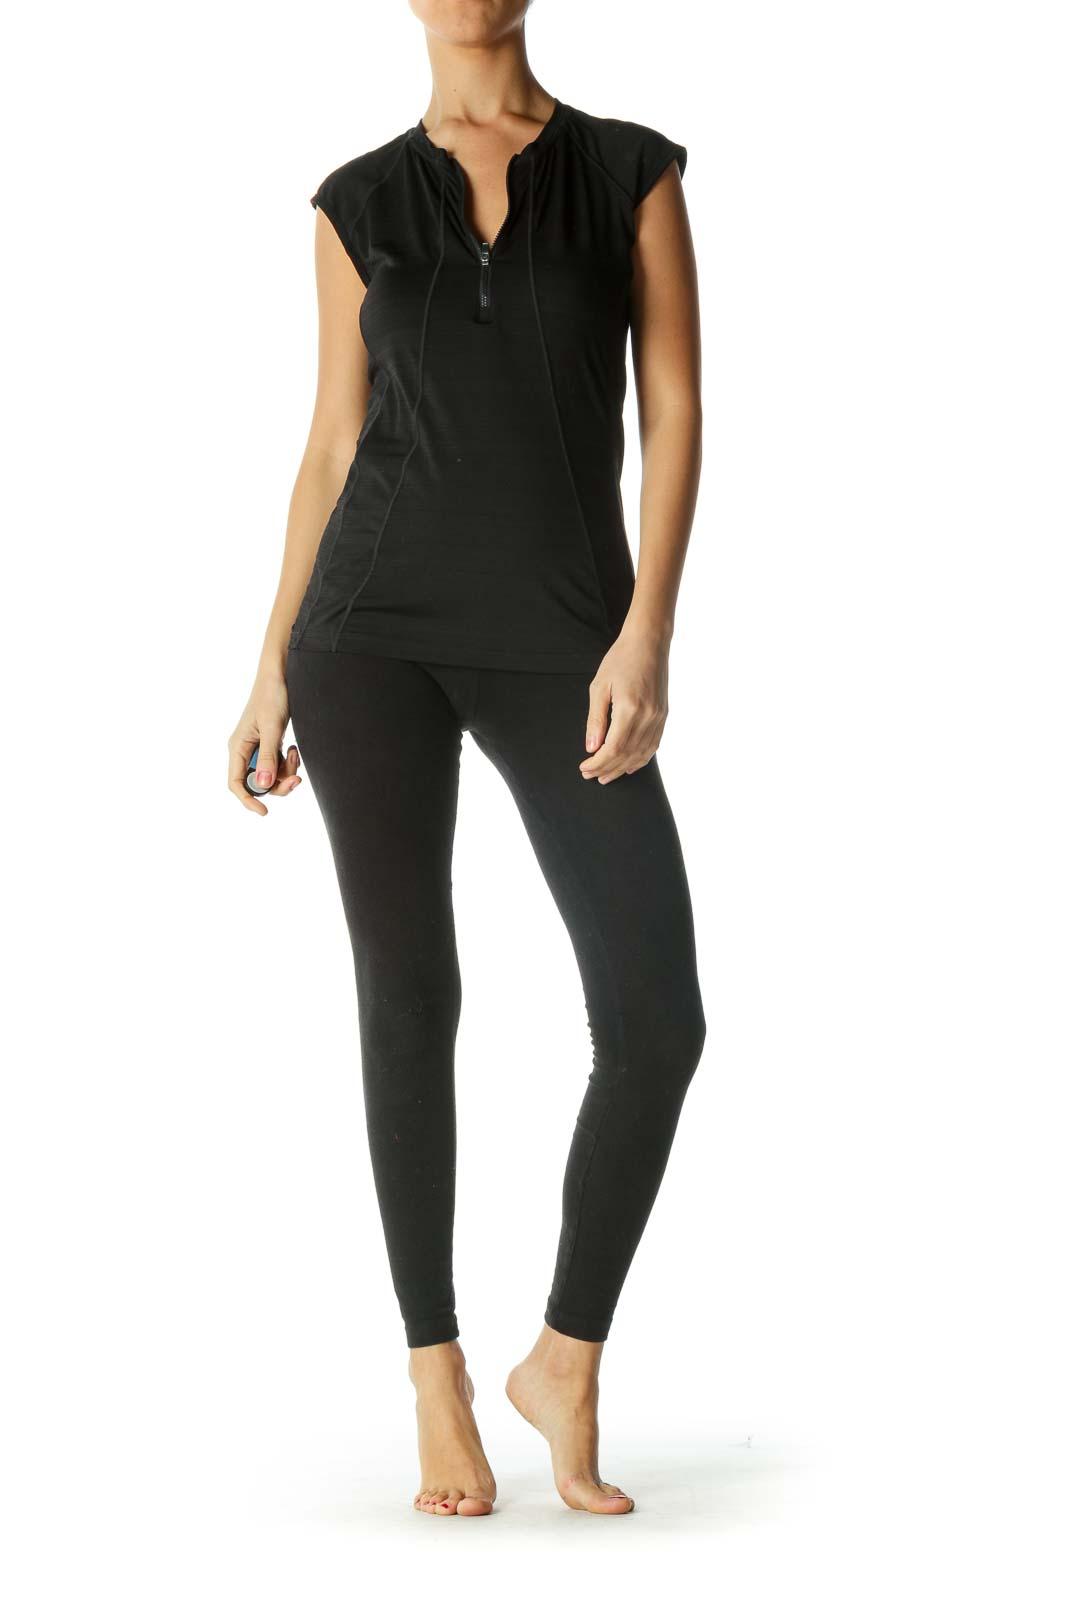 Black Zippered Stretch Sleeveless Active Top